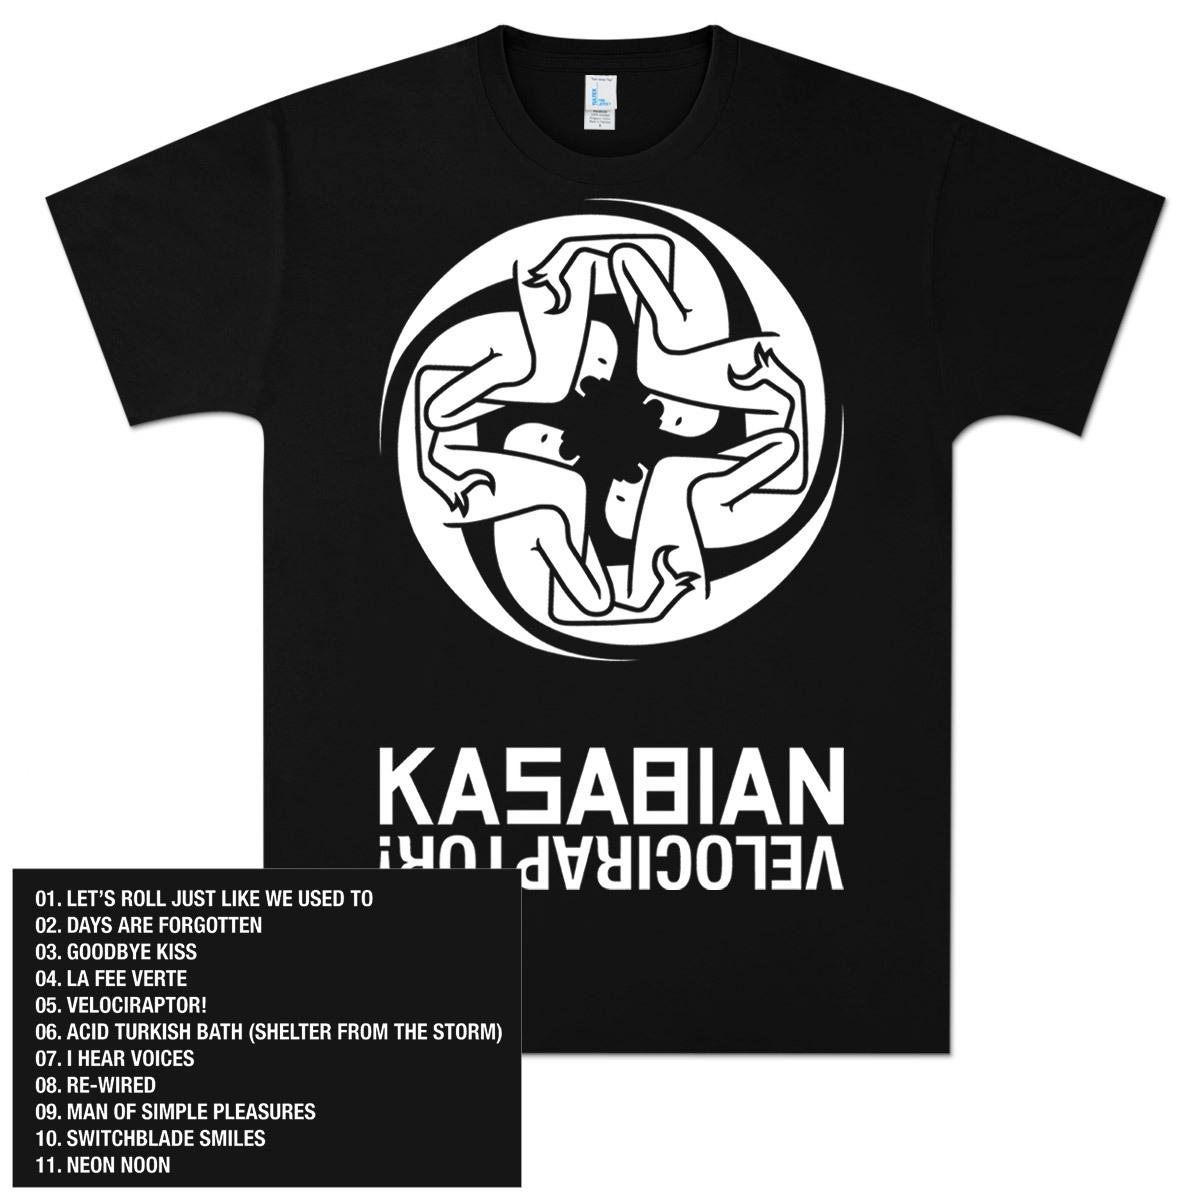 Kasabian Art & Tracks T-Shirt